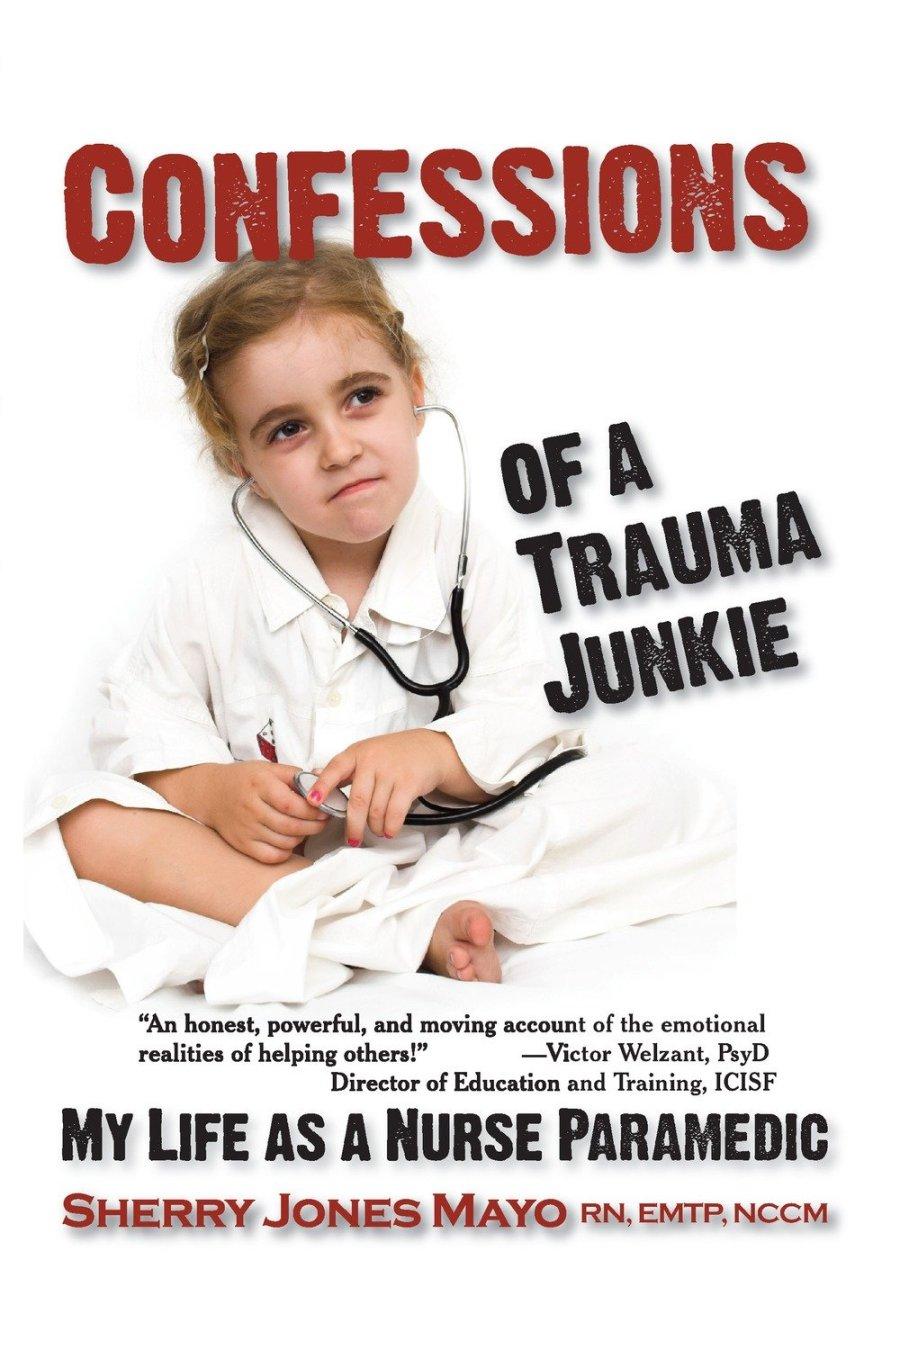 Confessions of a Trauma Junkie: My Life as a Nurse Paramedic